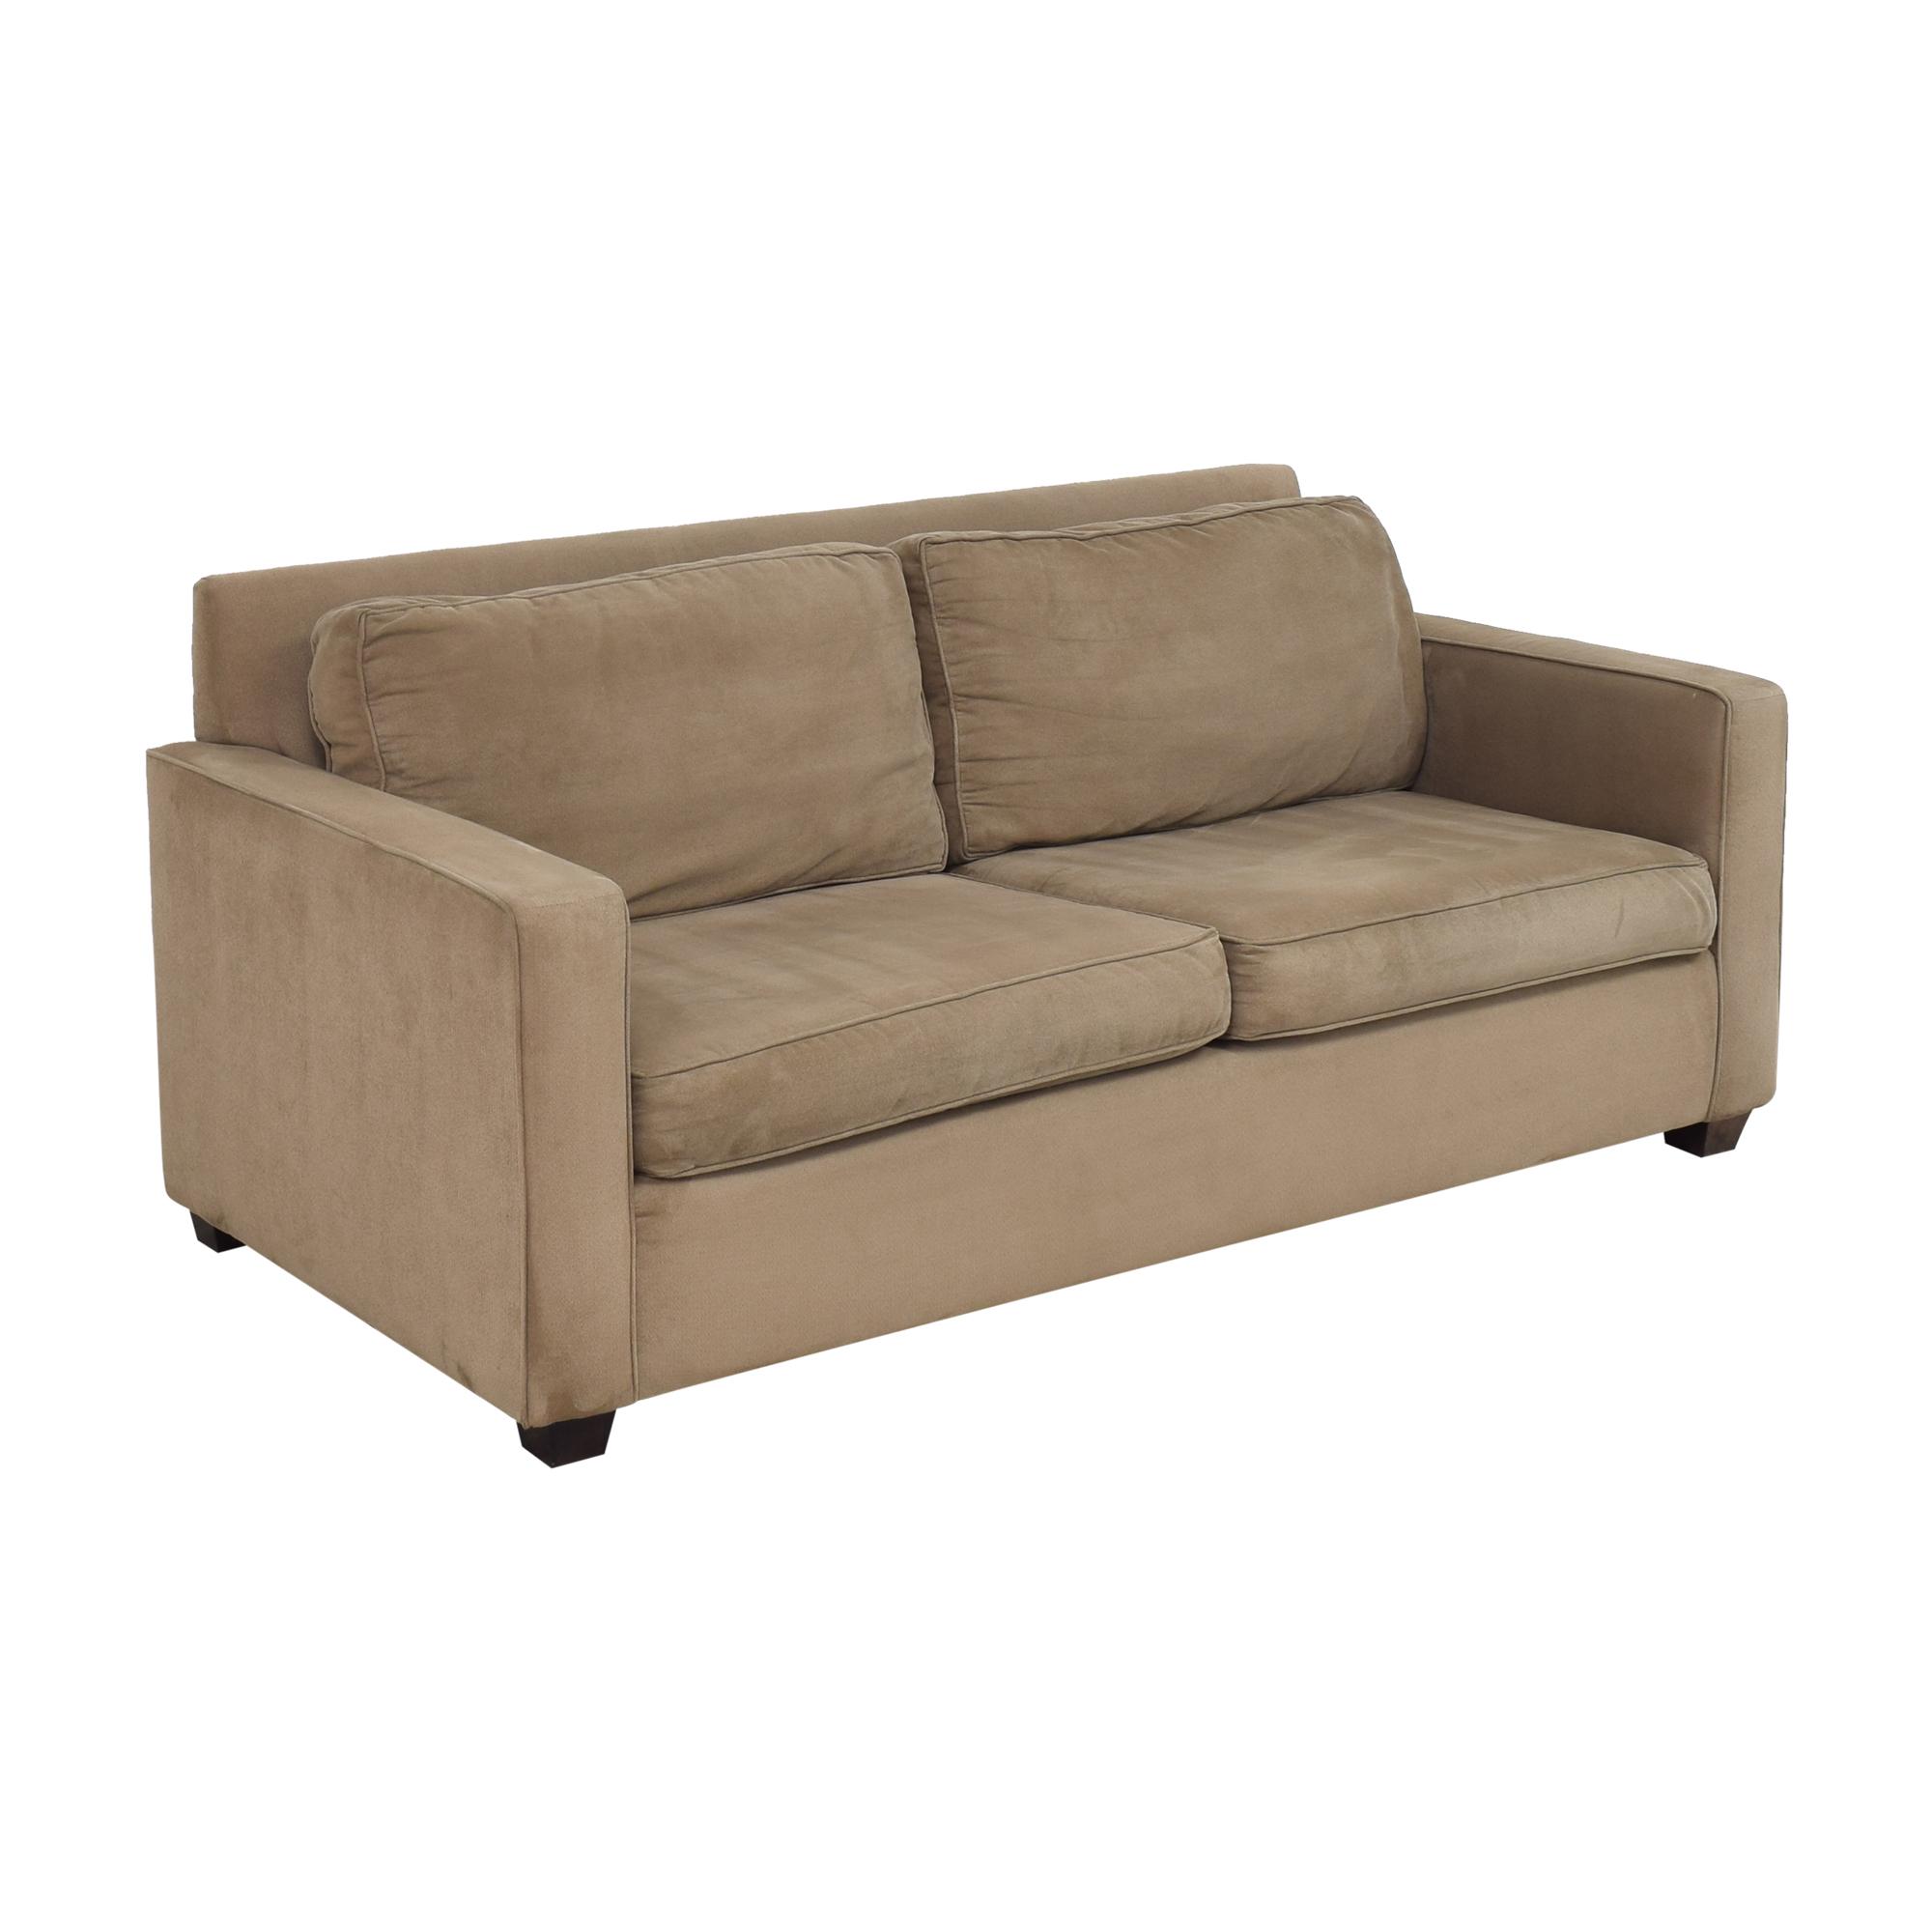 West Elm Henry Two Cushion Sofa West Elm